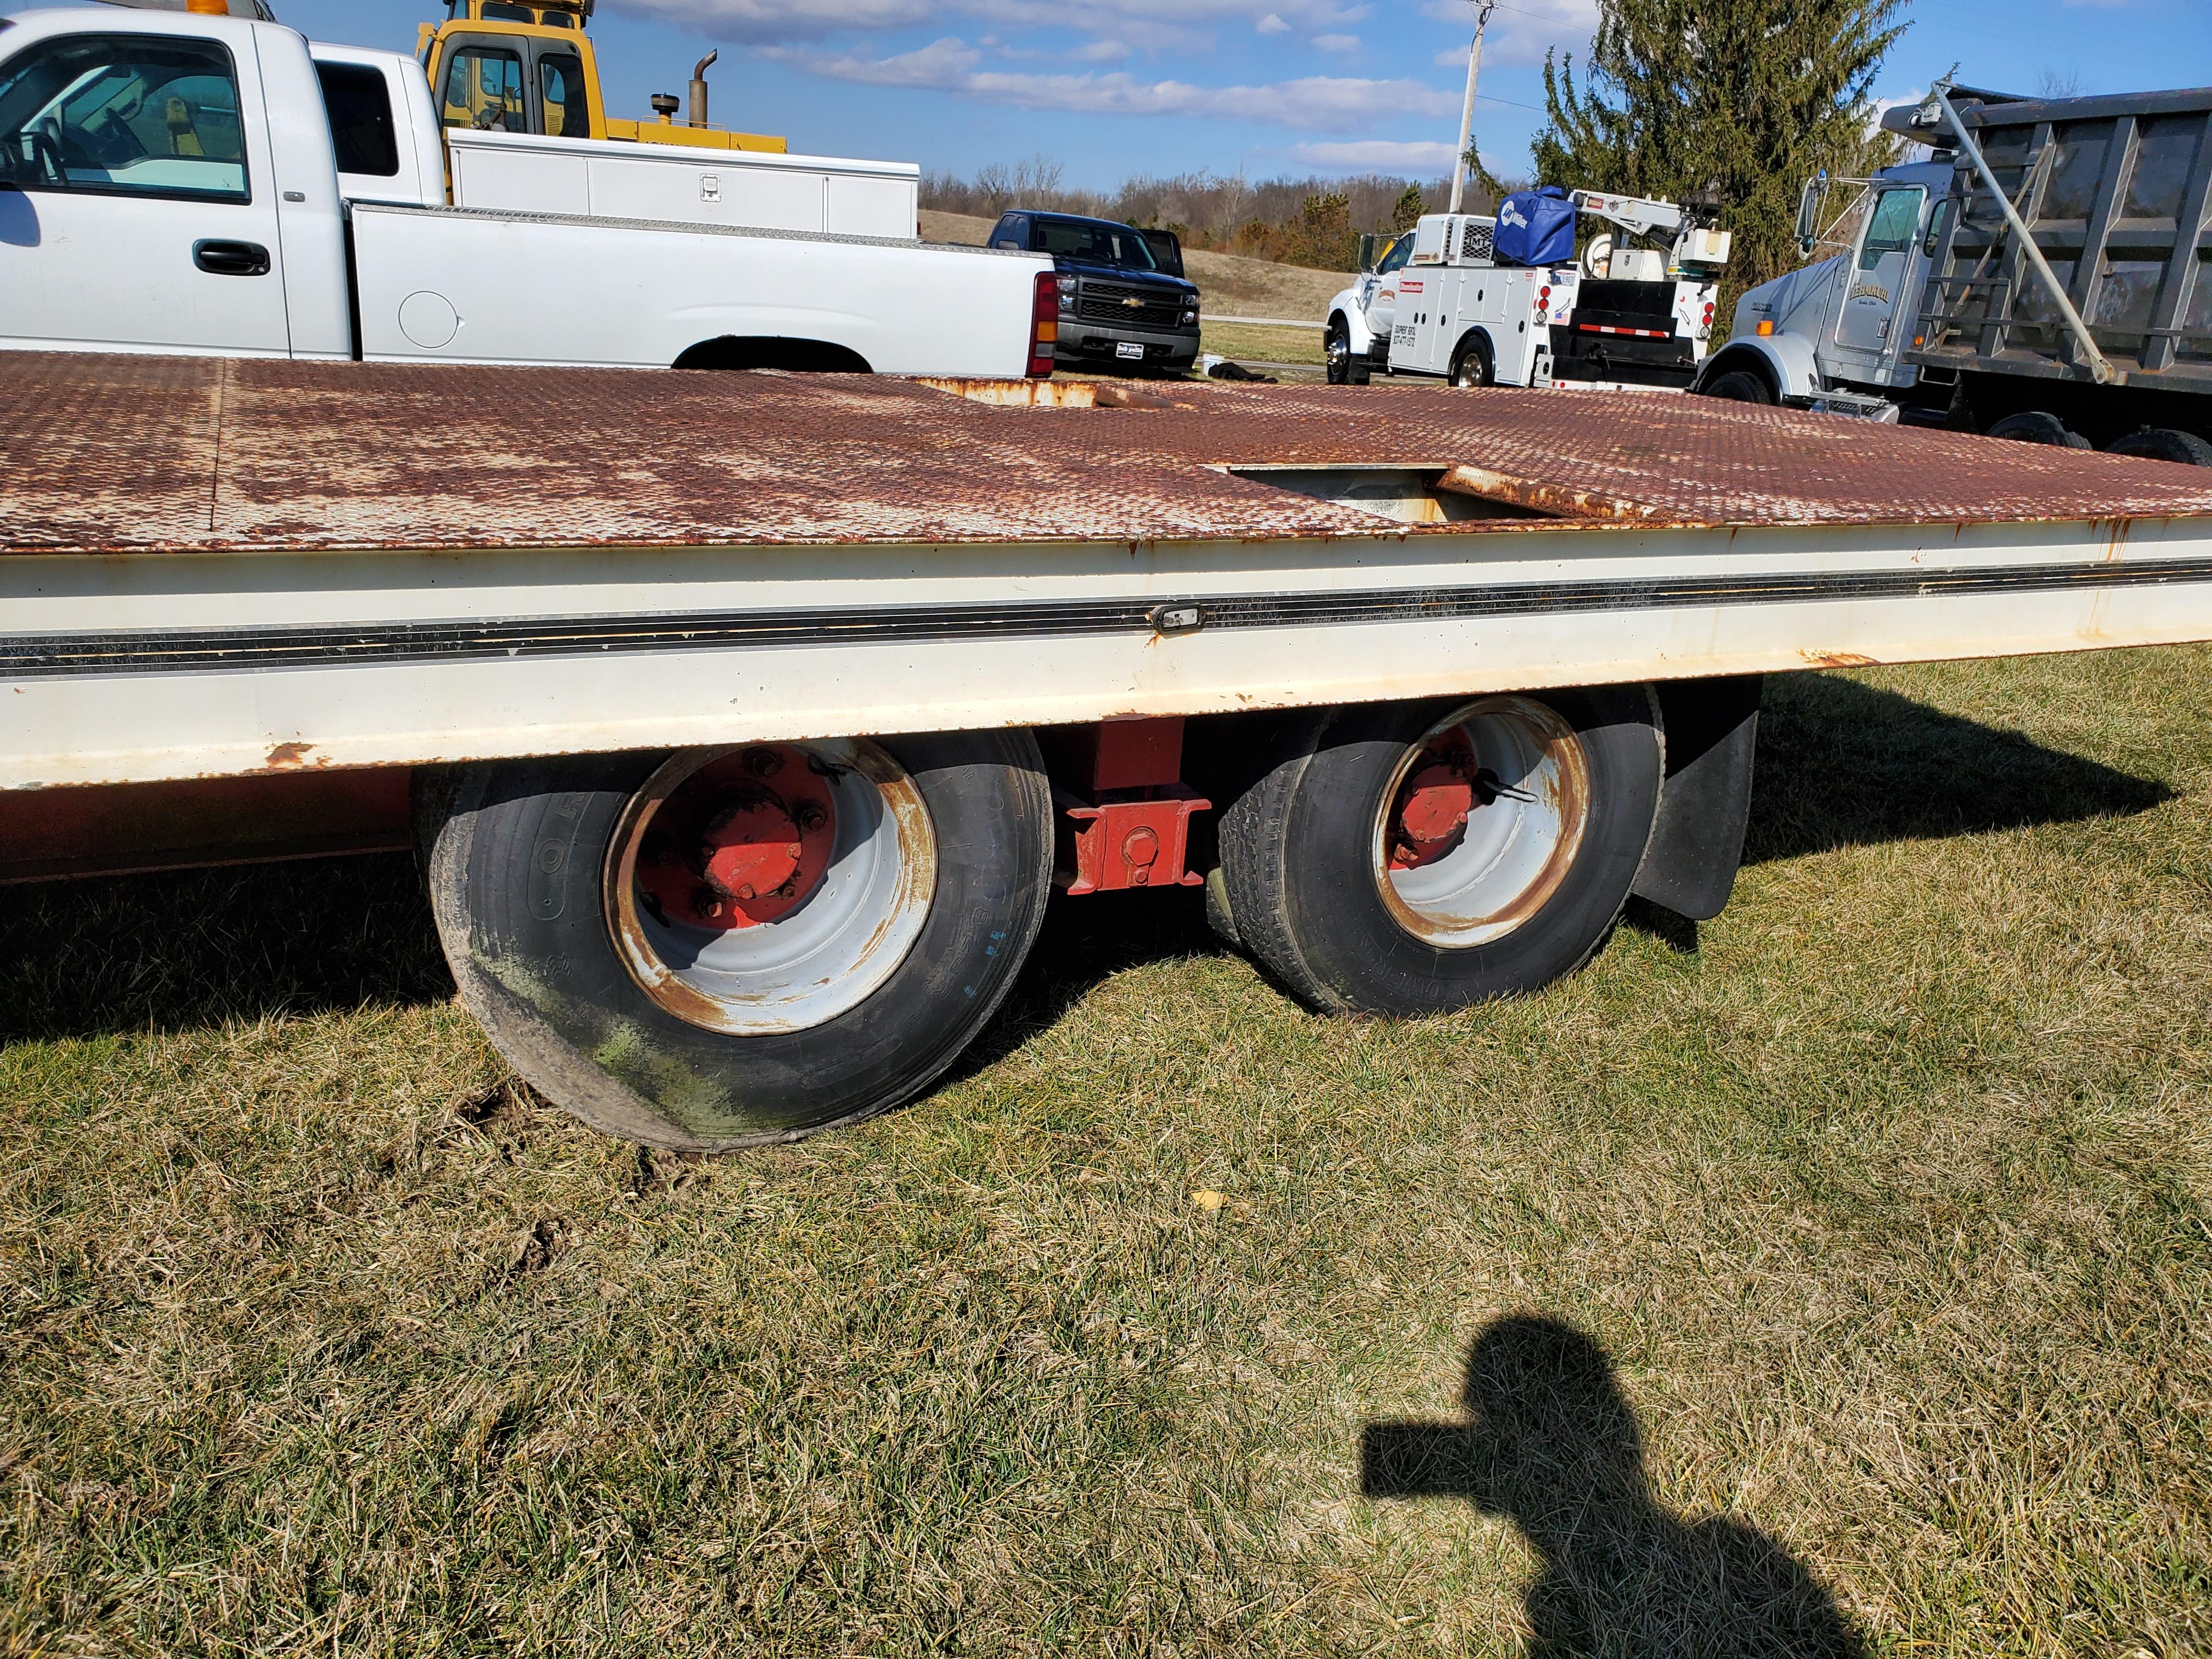 Miller Tilt Top Trailer Model OTG, s/n 8816, 22 ft. Long x 8 ft. Wide, Tandem Axle w/ Dual Wheels - Image 3 of 7